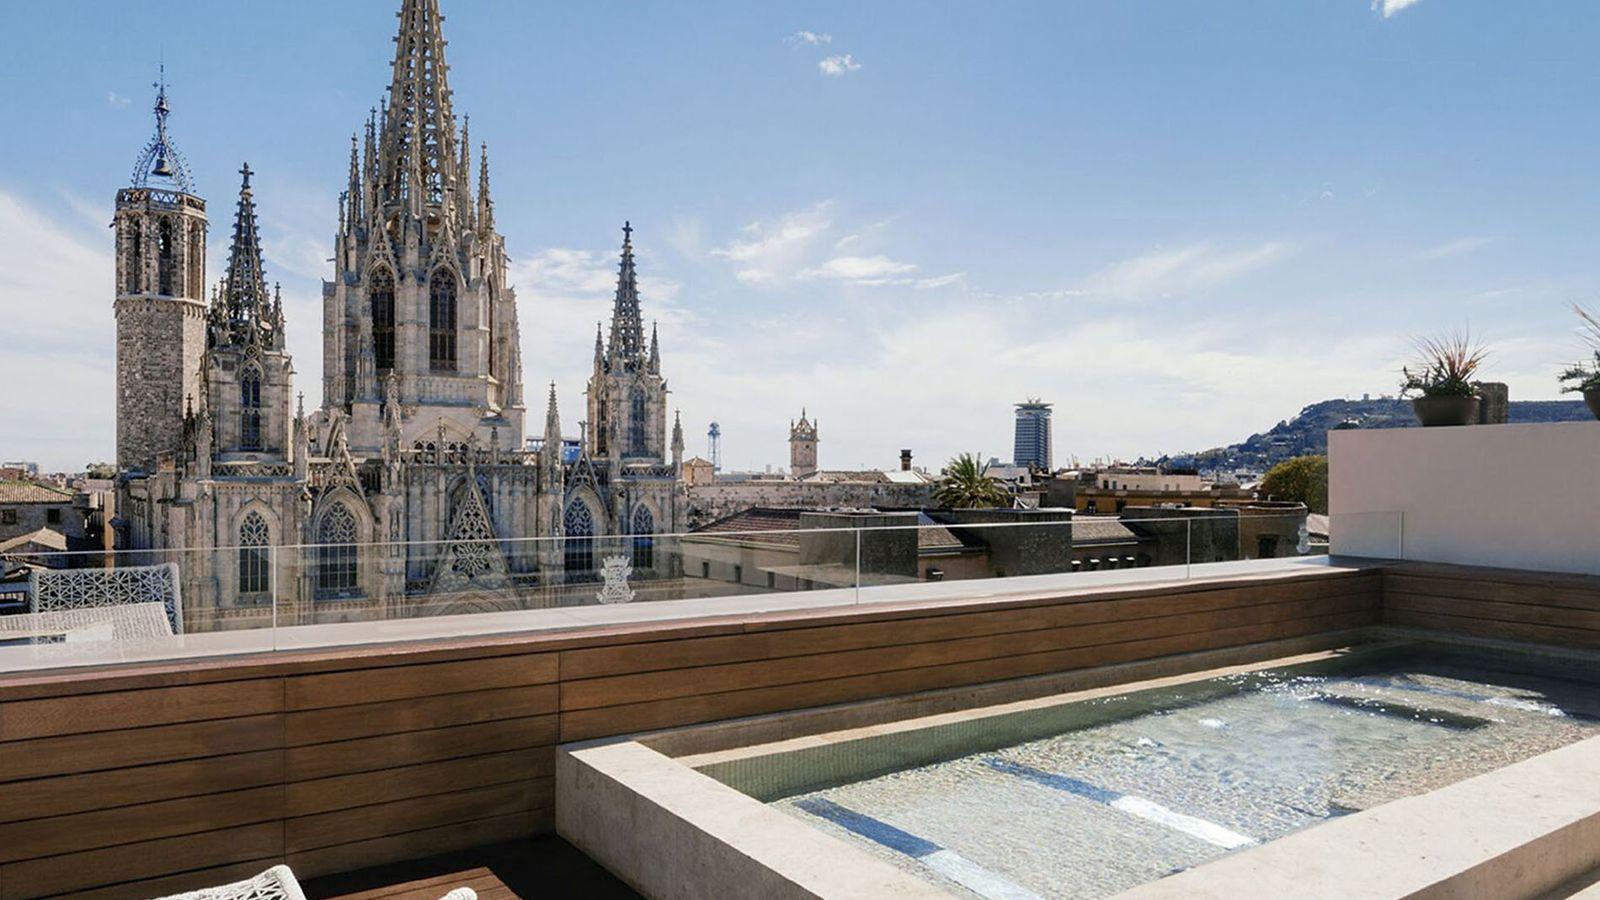 Rooftop pool overlooking city